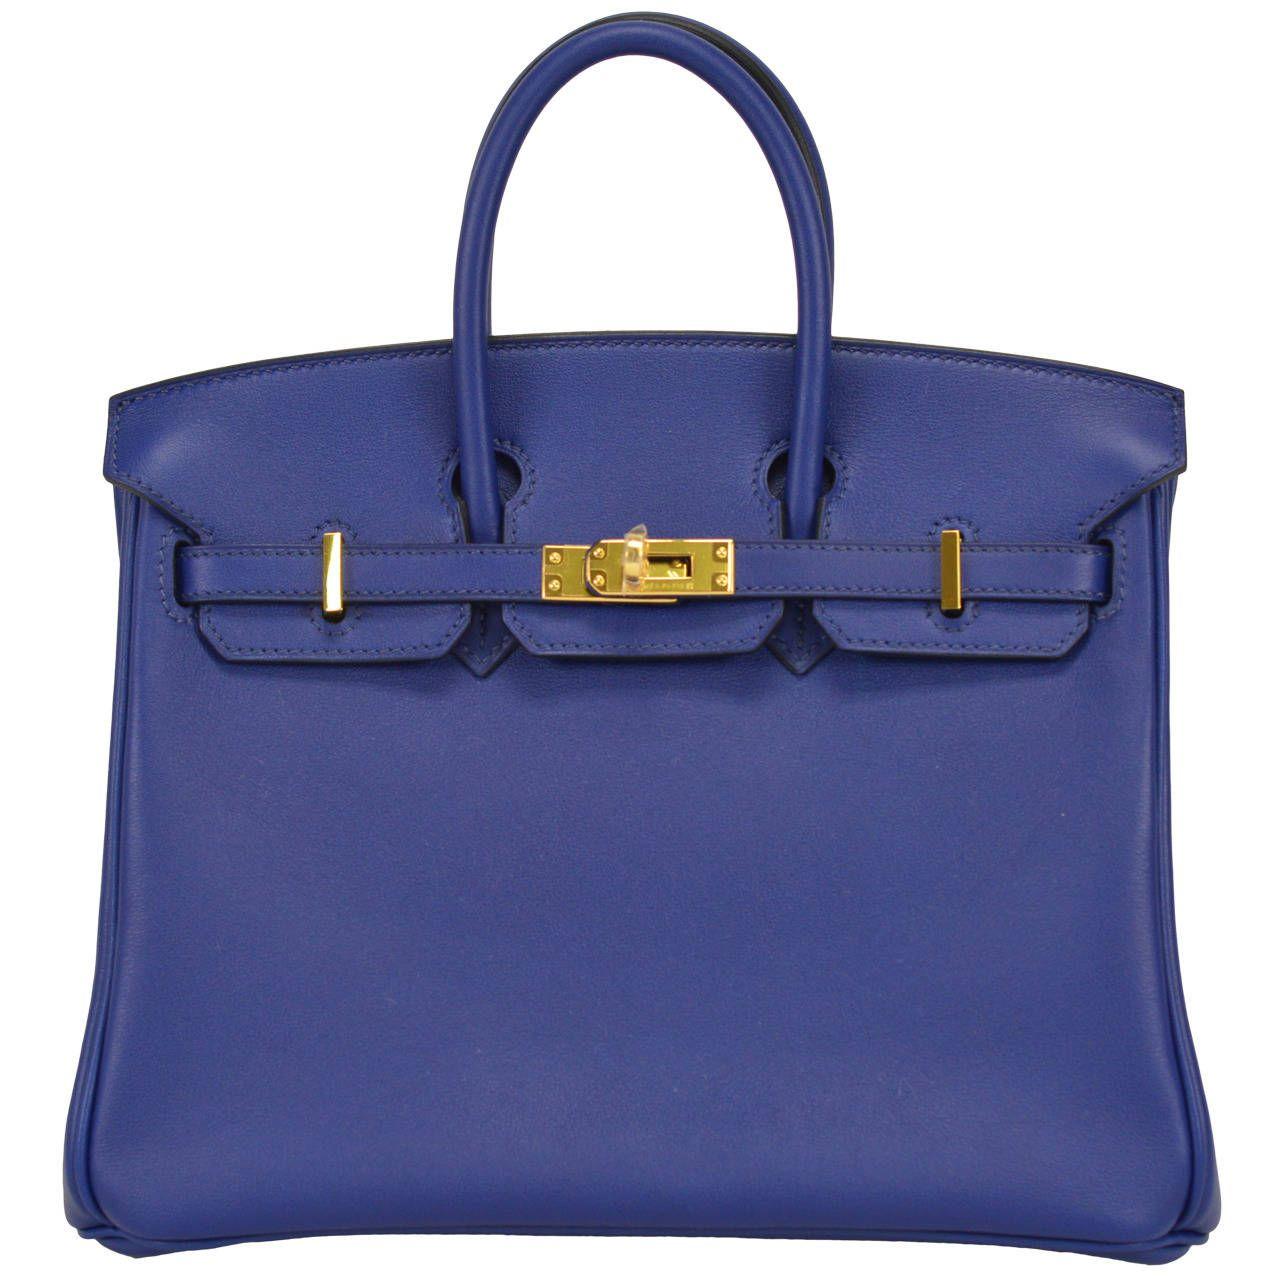 2014 HERMES Birkin Bag 25cm Blue Gold Hardware  2f762b2c7305f